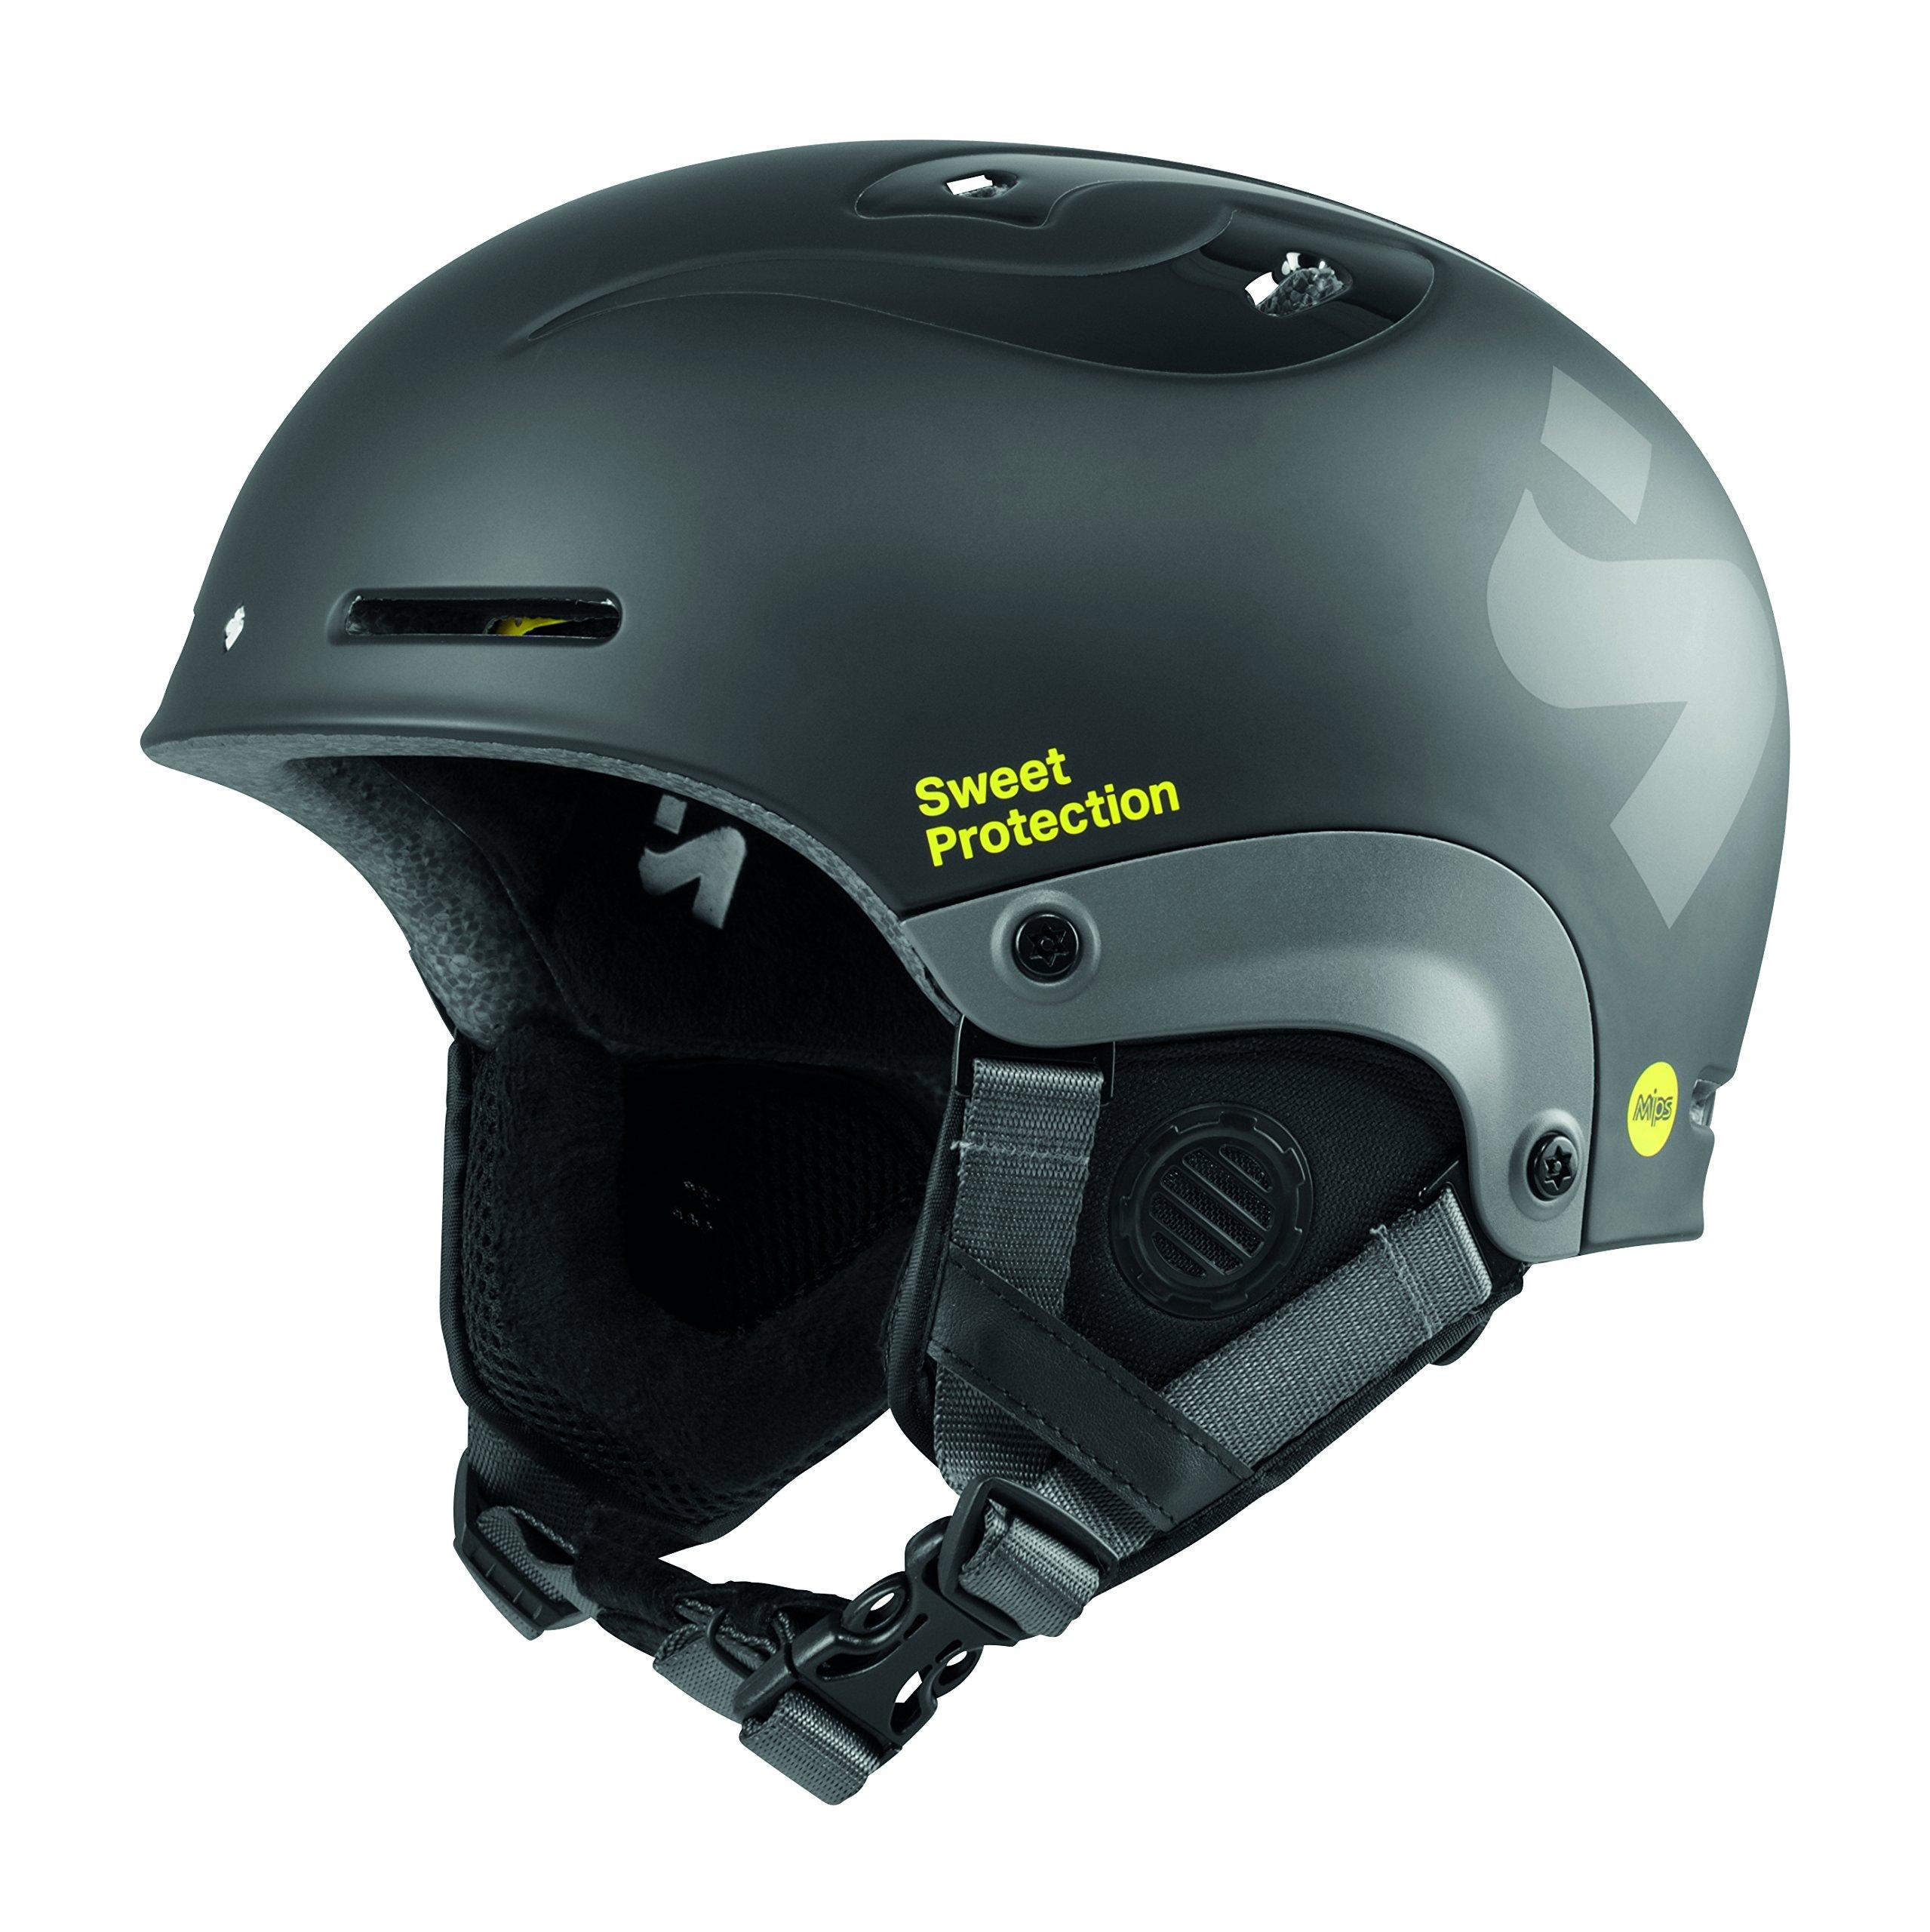 Sweet Protection 儿童玩具枪 Ii MIPS 头盔